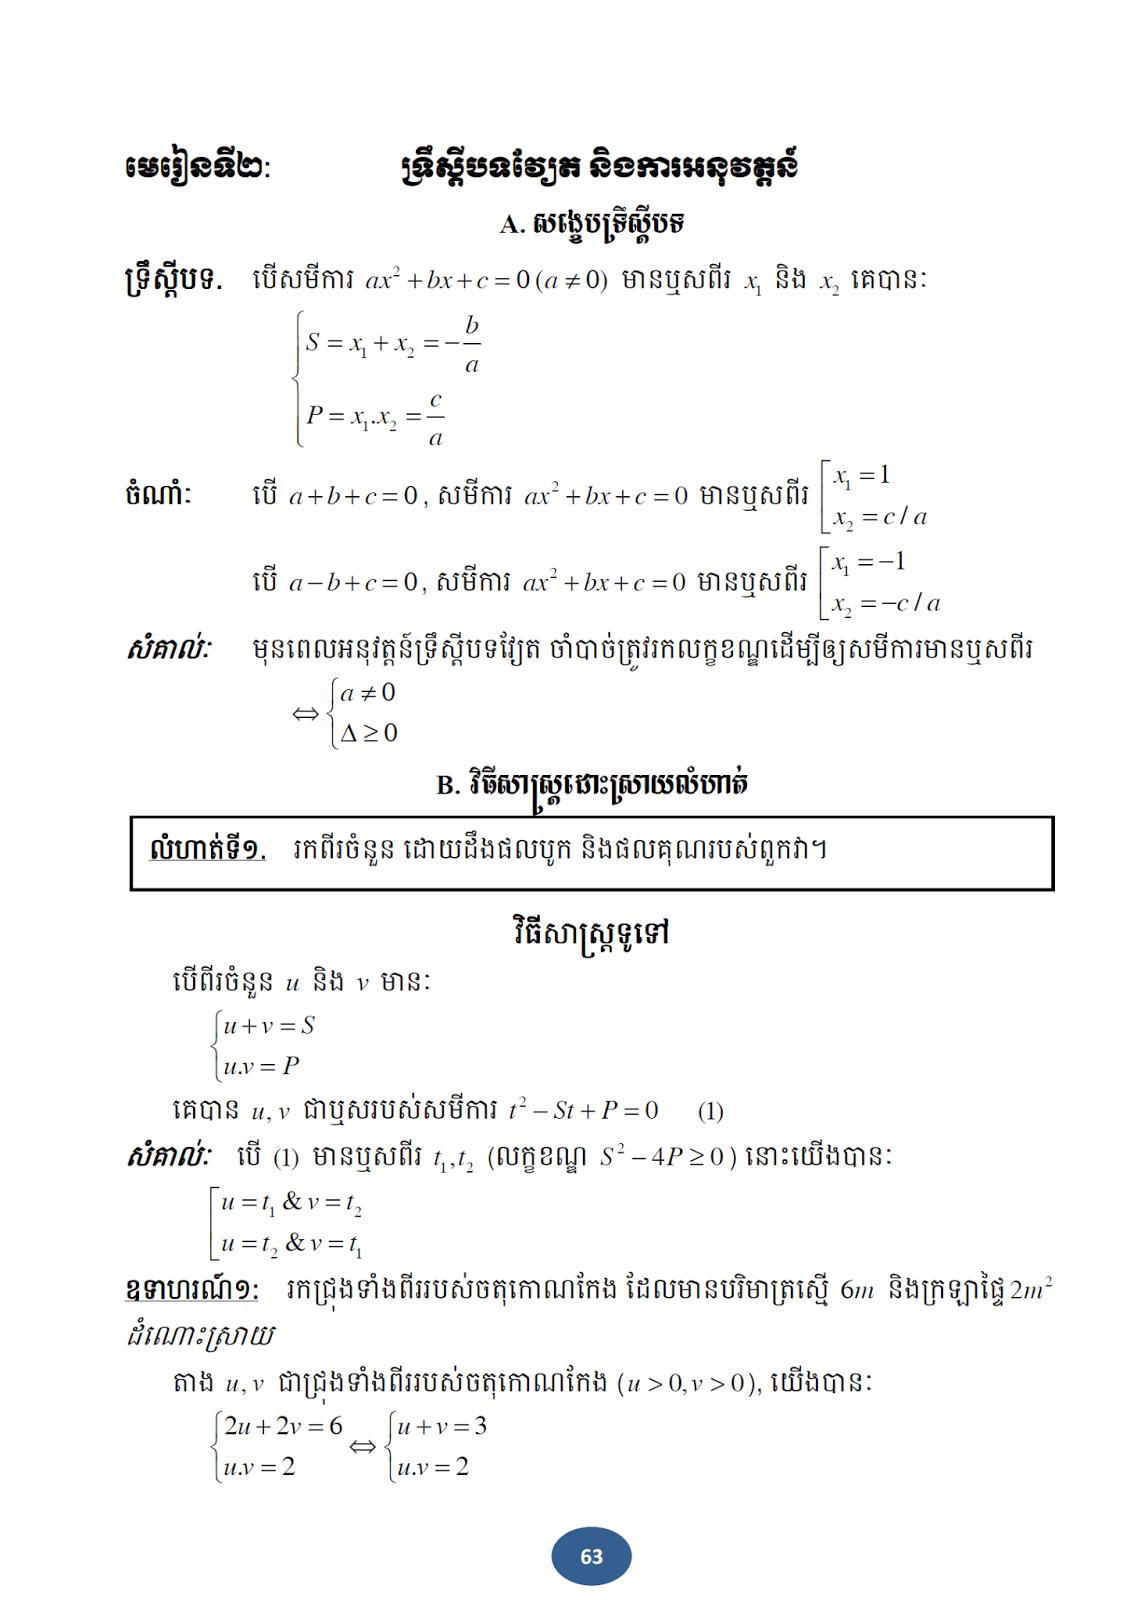 math worksheet : math formula grade 12  grade 12 math word problems with solutions  : Grade 12 Math Worksheets